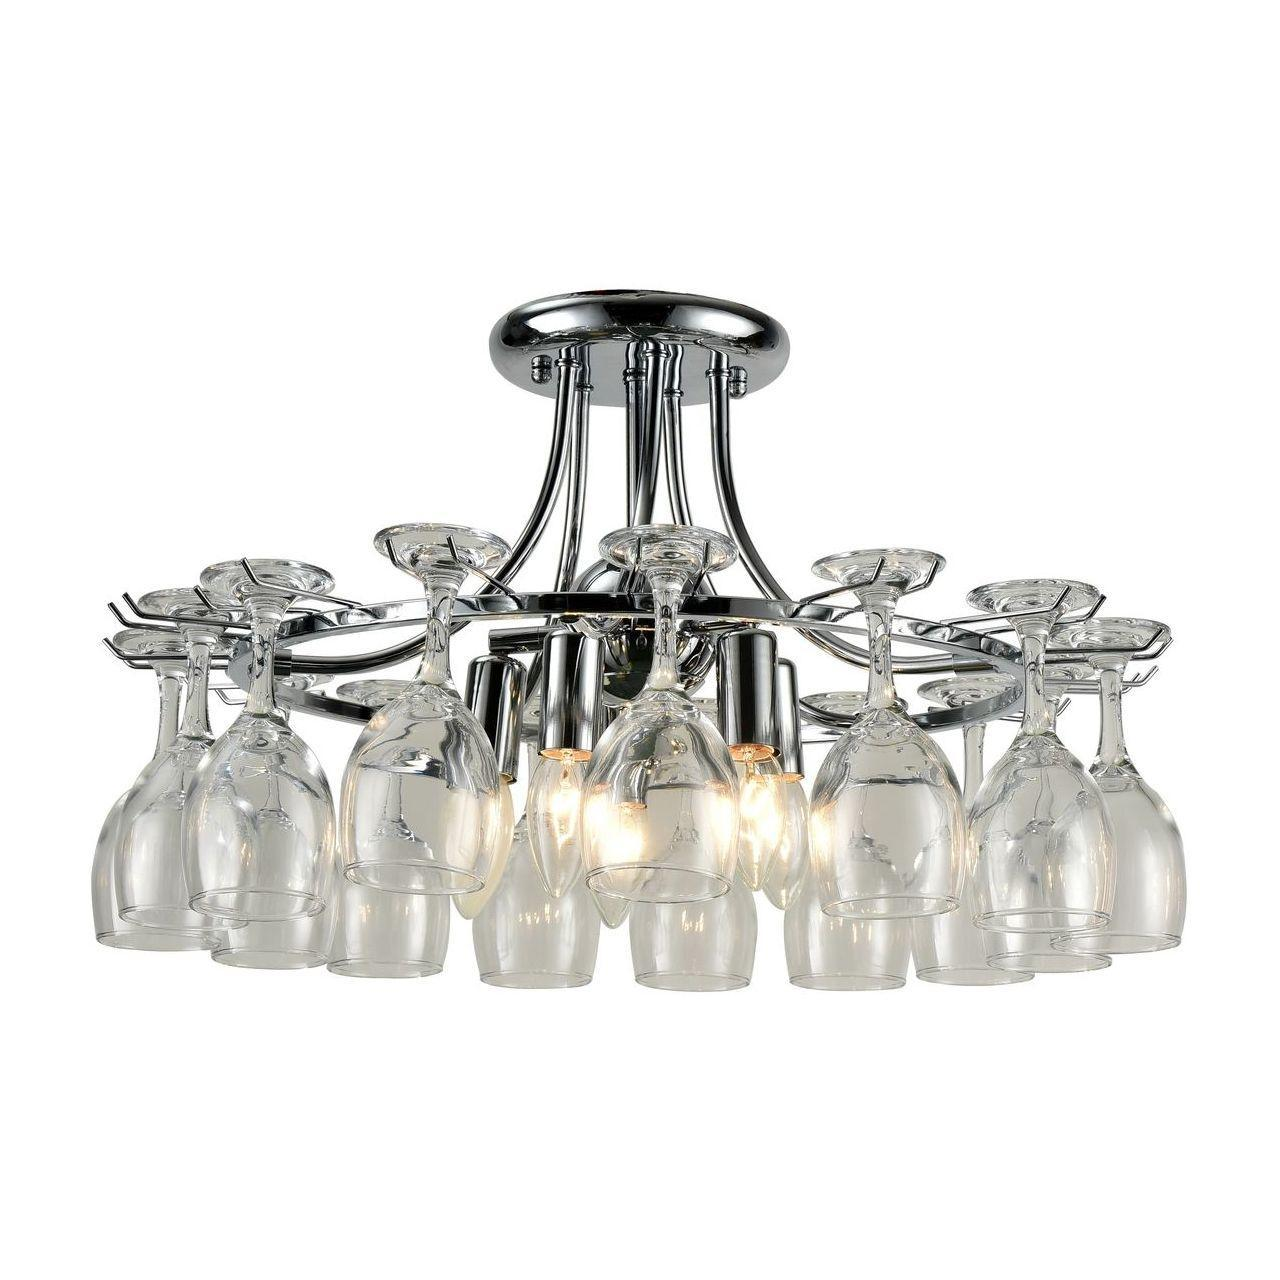 Люстра Arte Lamp A7043PL-5CC потолочная потолочная люстра arte lamp glassy арт a8240pl 5cc